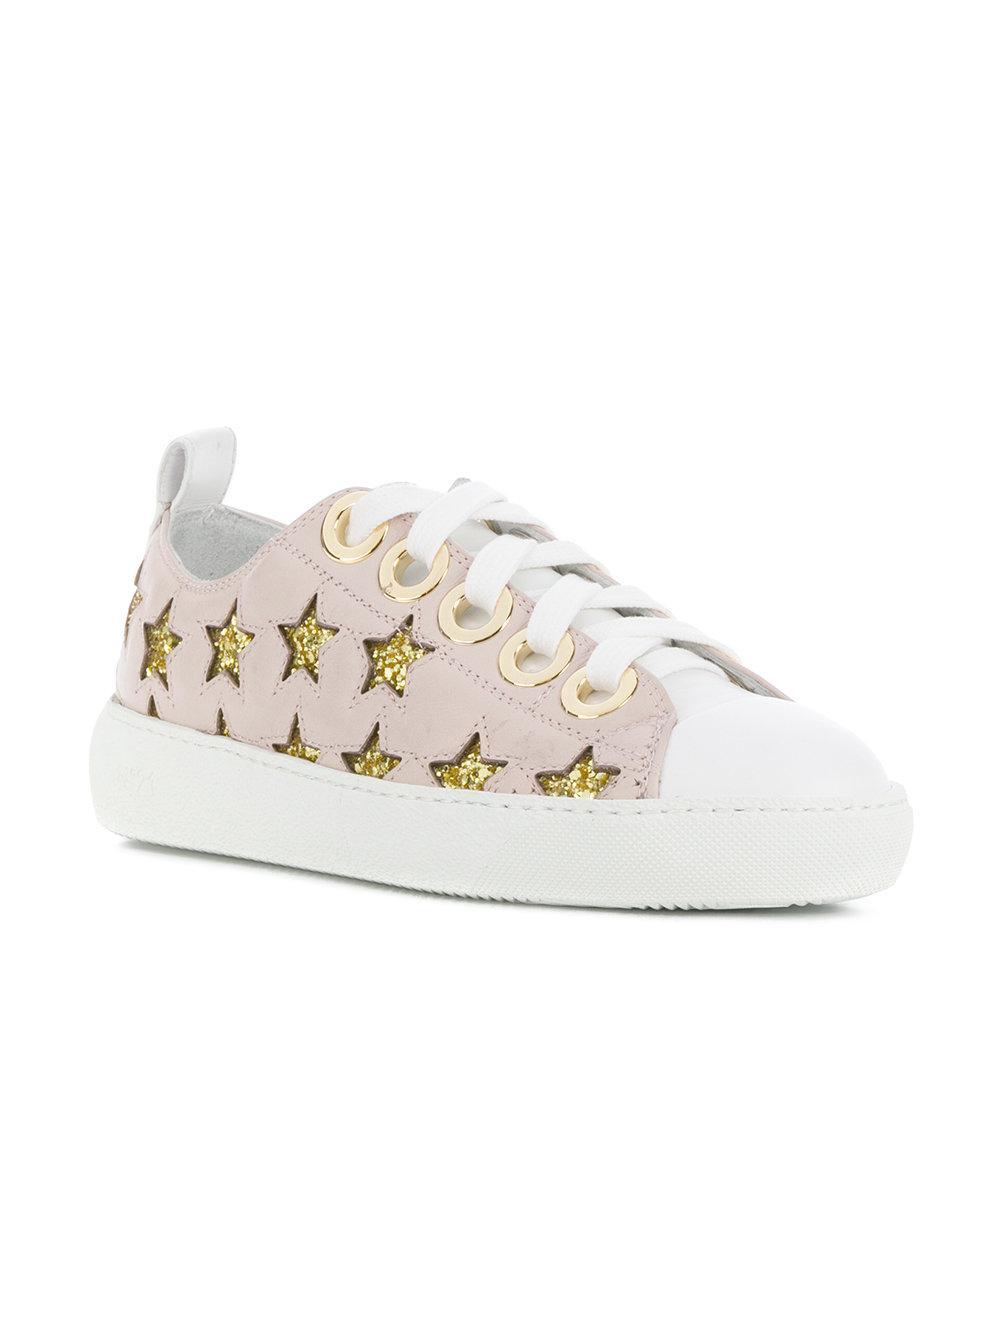 N°21 Leather Low-top Star Sneakers in Pink & Purple (Pink)